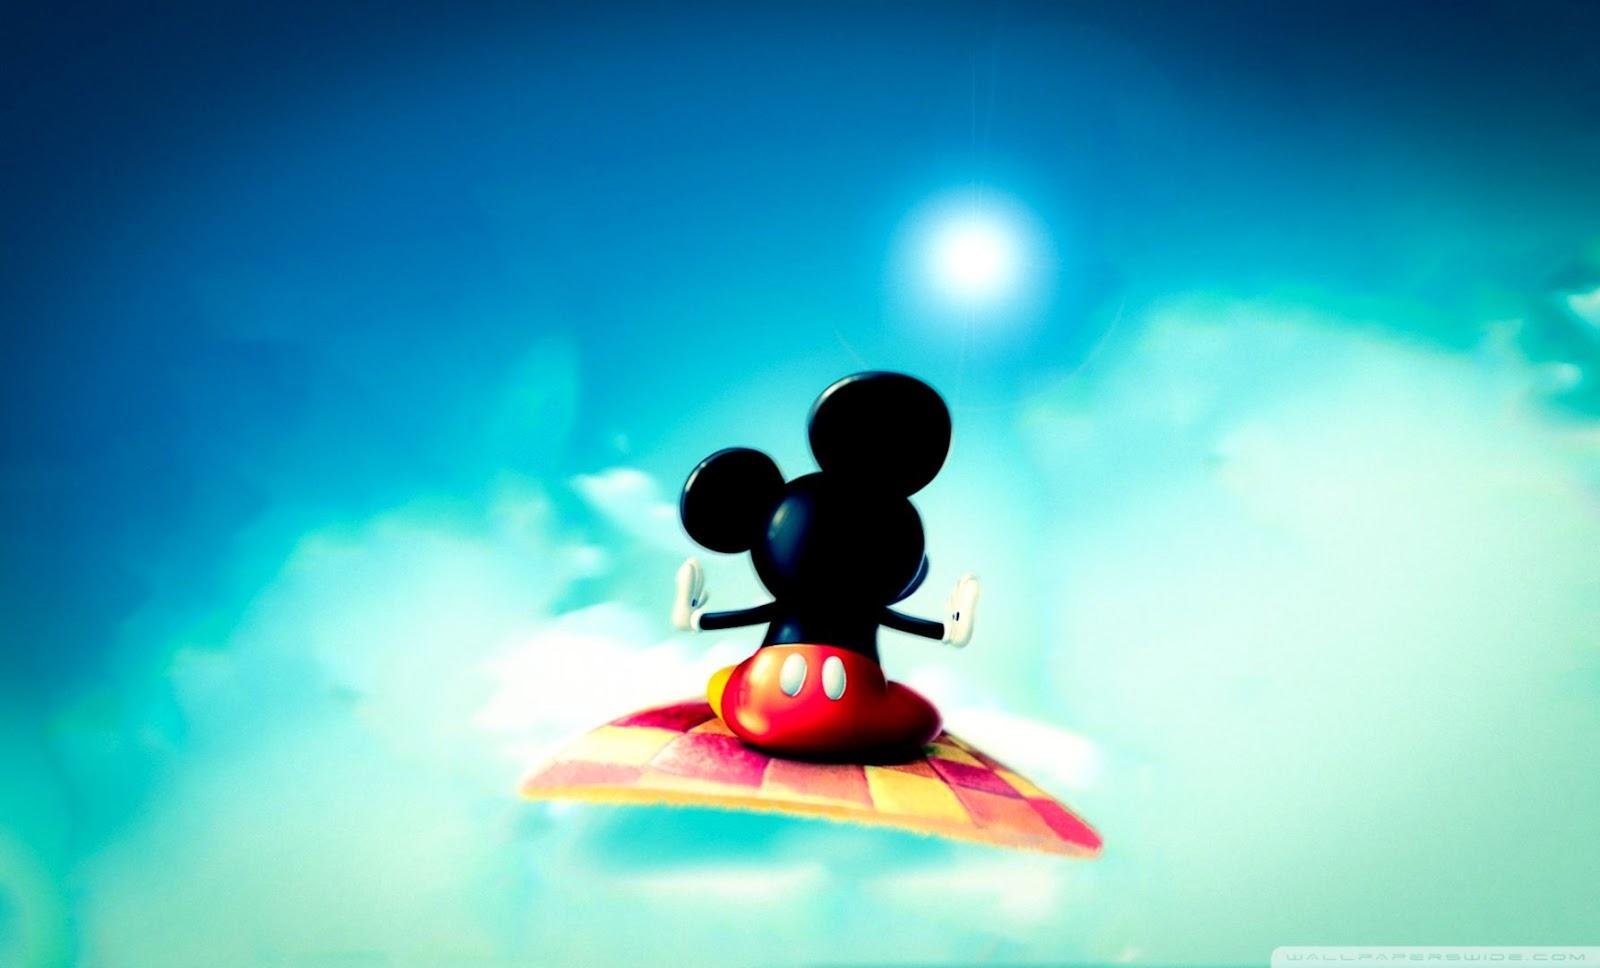 Disney Wallpapers Hd Desktop Wallpapers Records